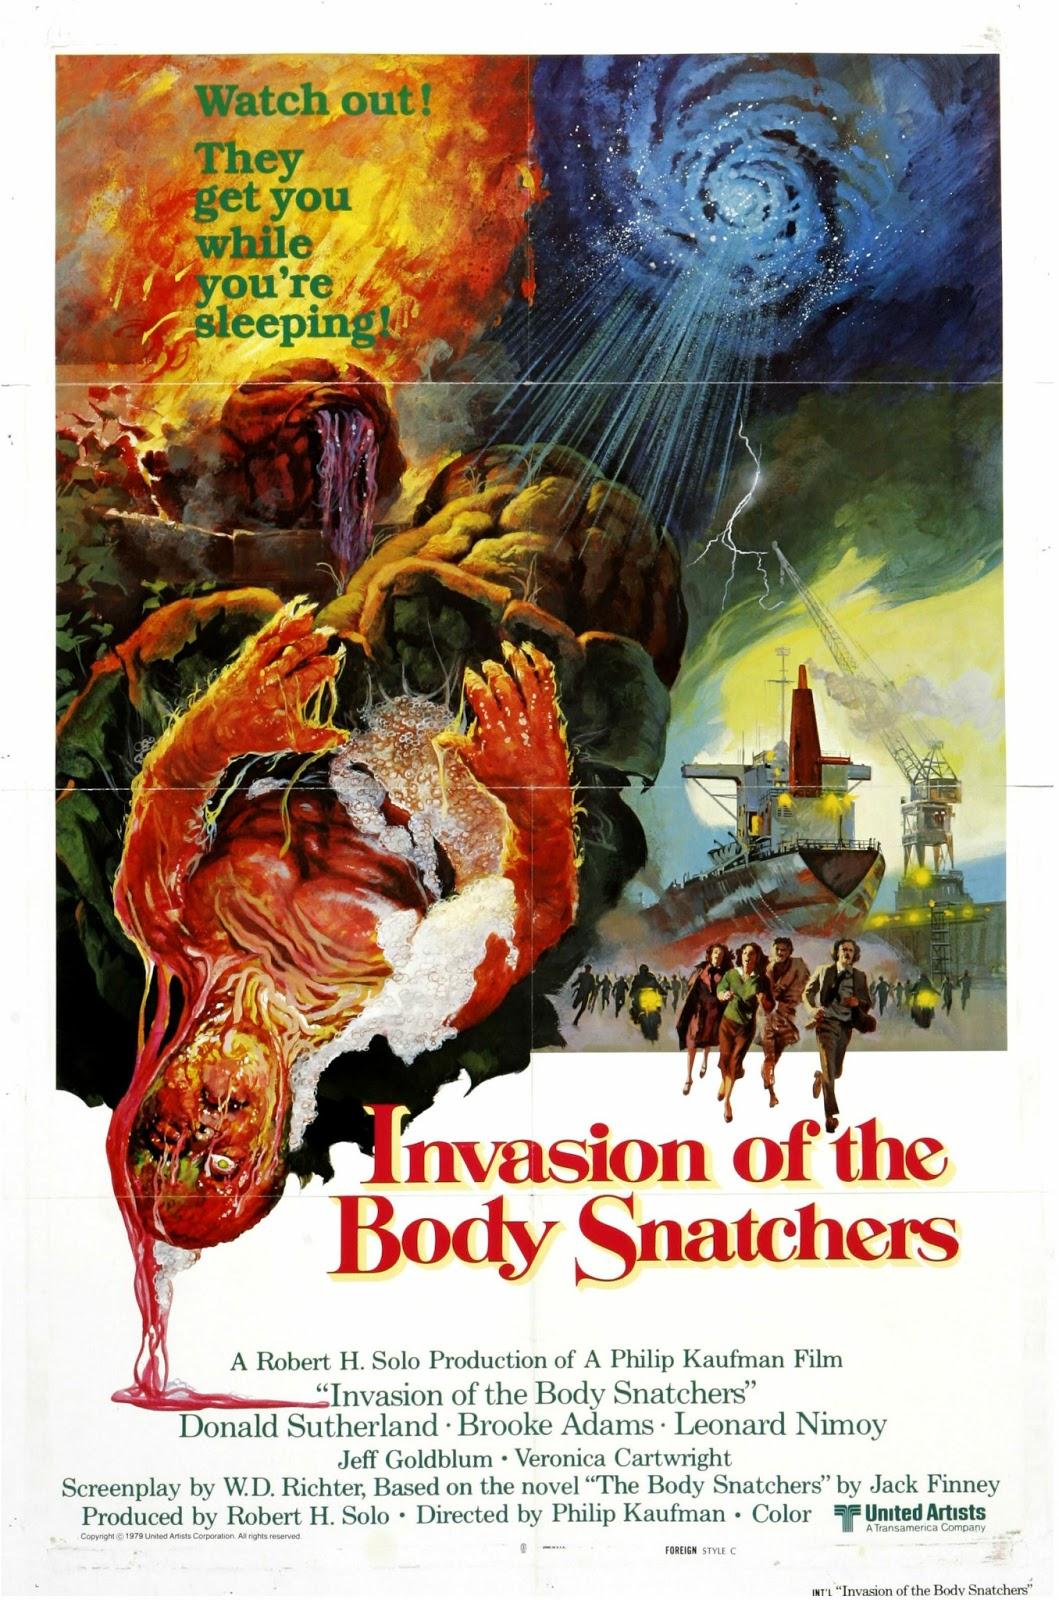 https://i2.wp.com/curnblog.com/wp-content/uploads/2016/10/invasion-of-the-body-snatchers-1978-poster.jpg